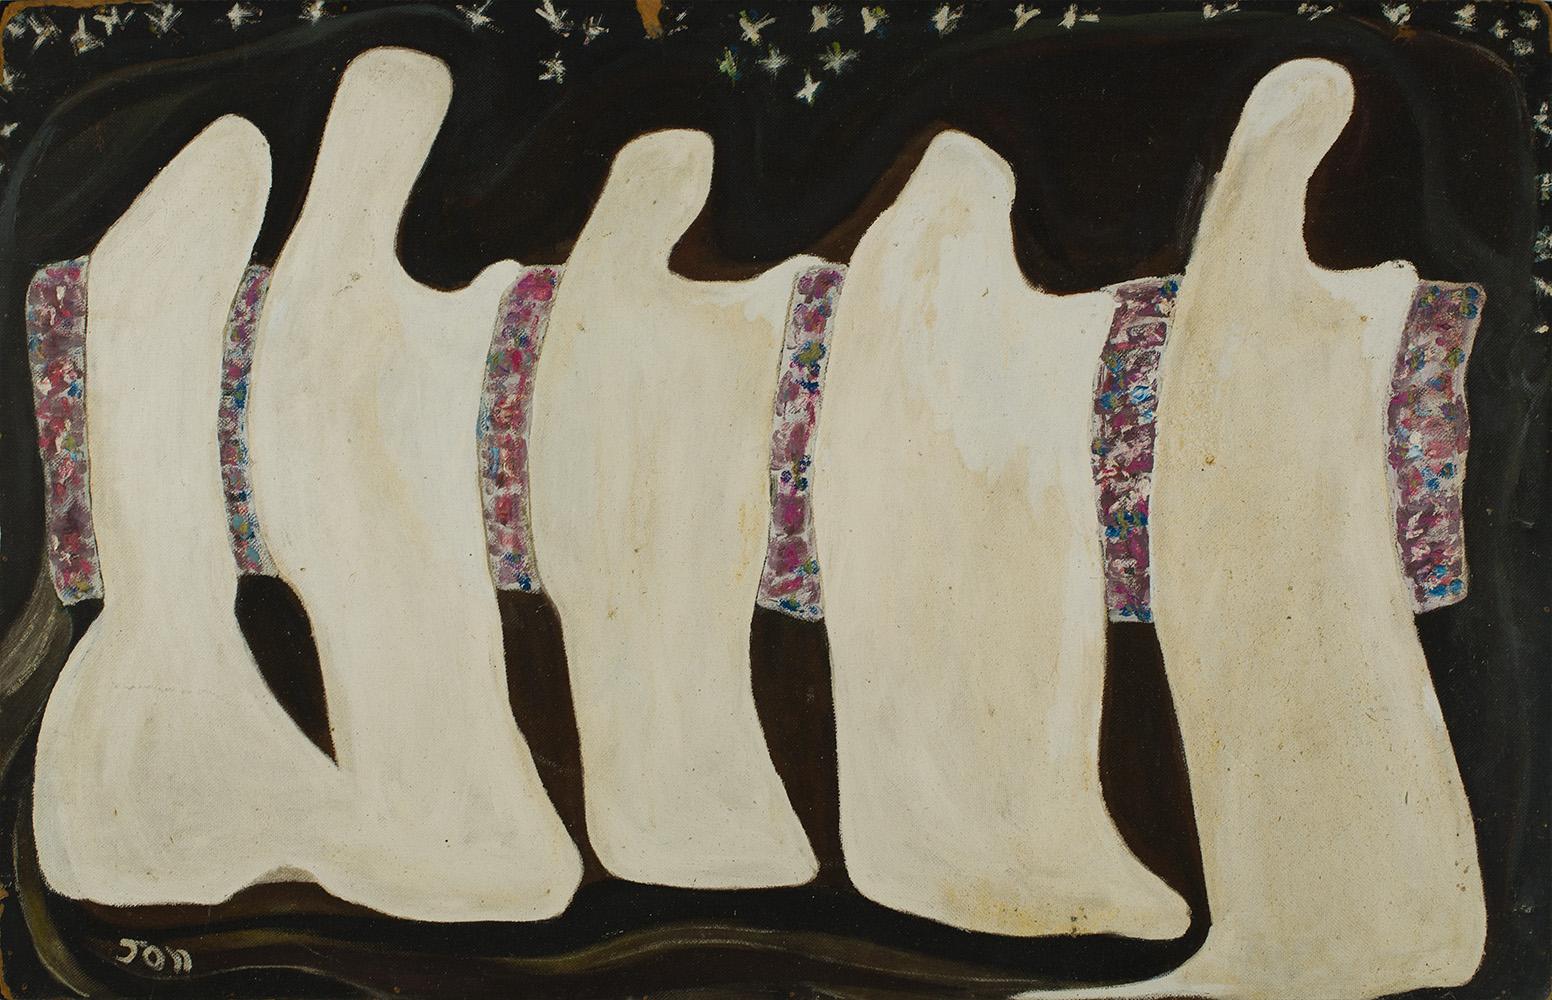 Jon Serl    Five Nuns   Oil on board 31 x 48 inches 78.7 x 121.9 cm SJ 498